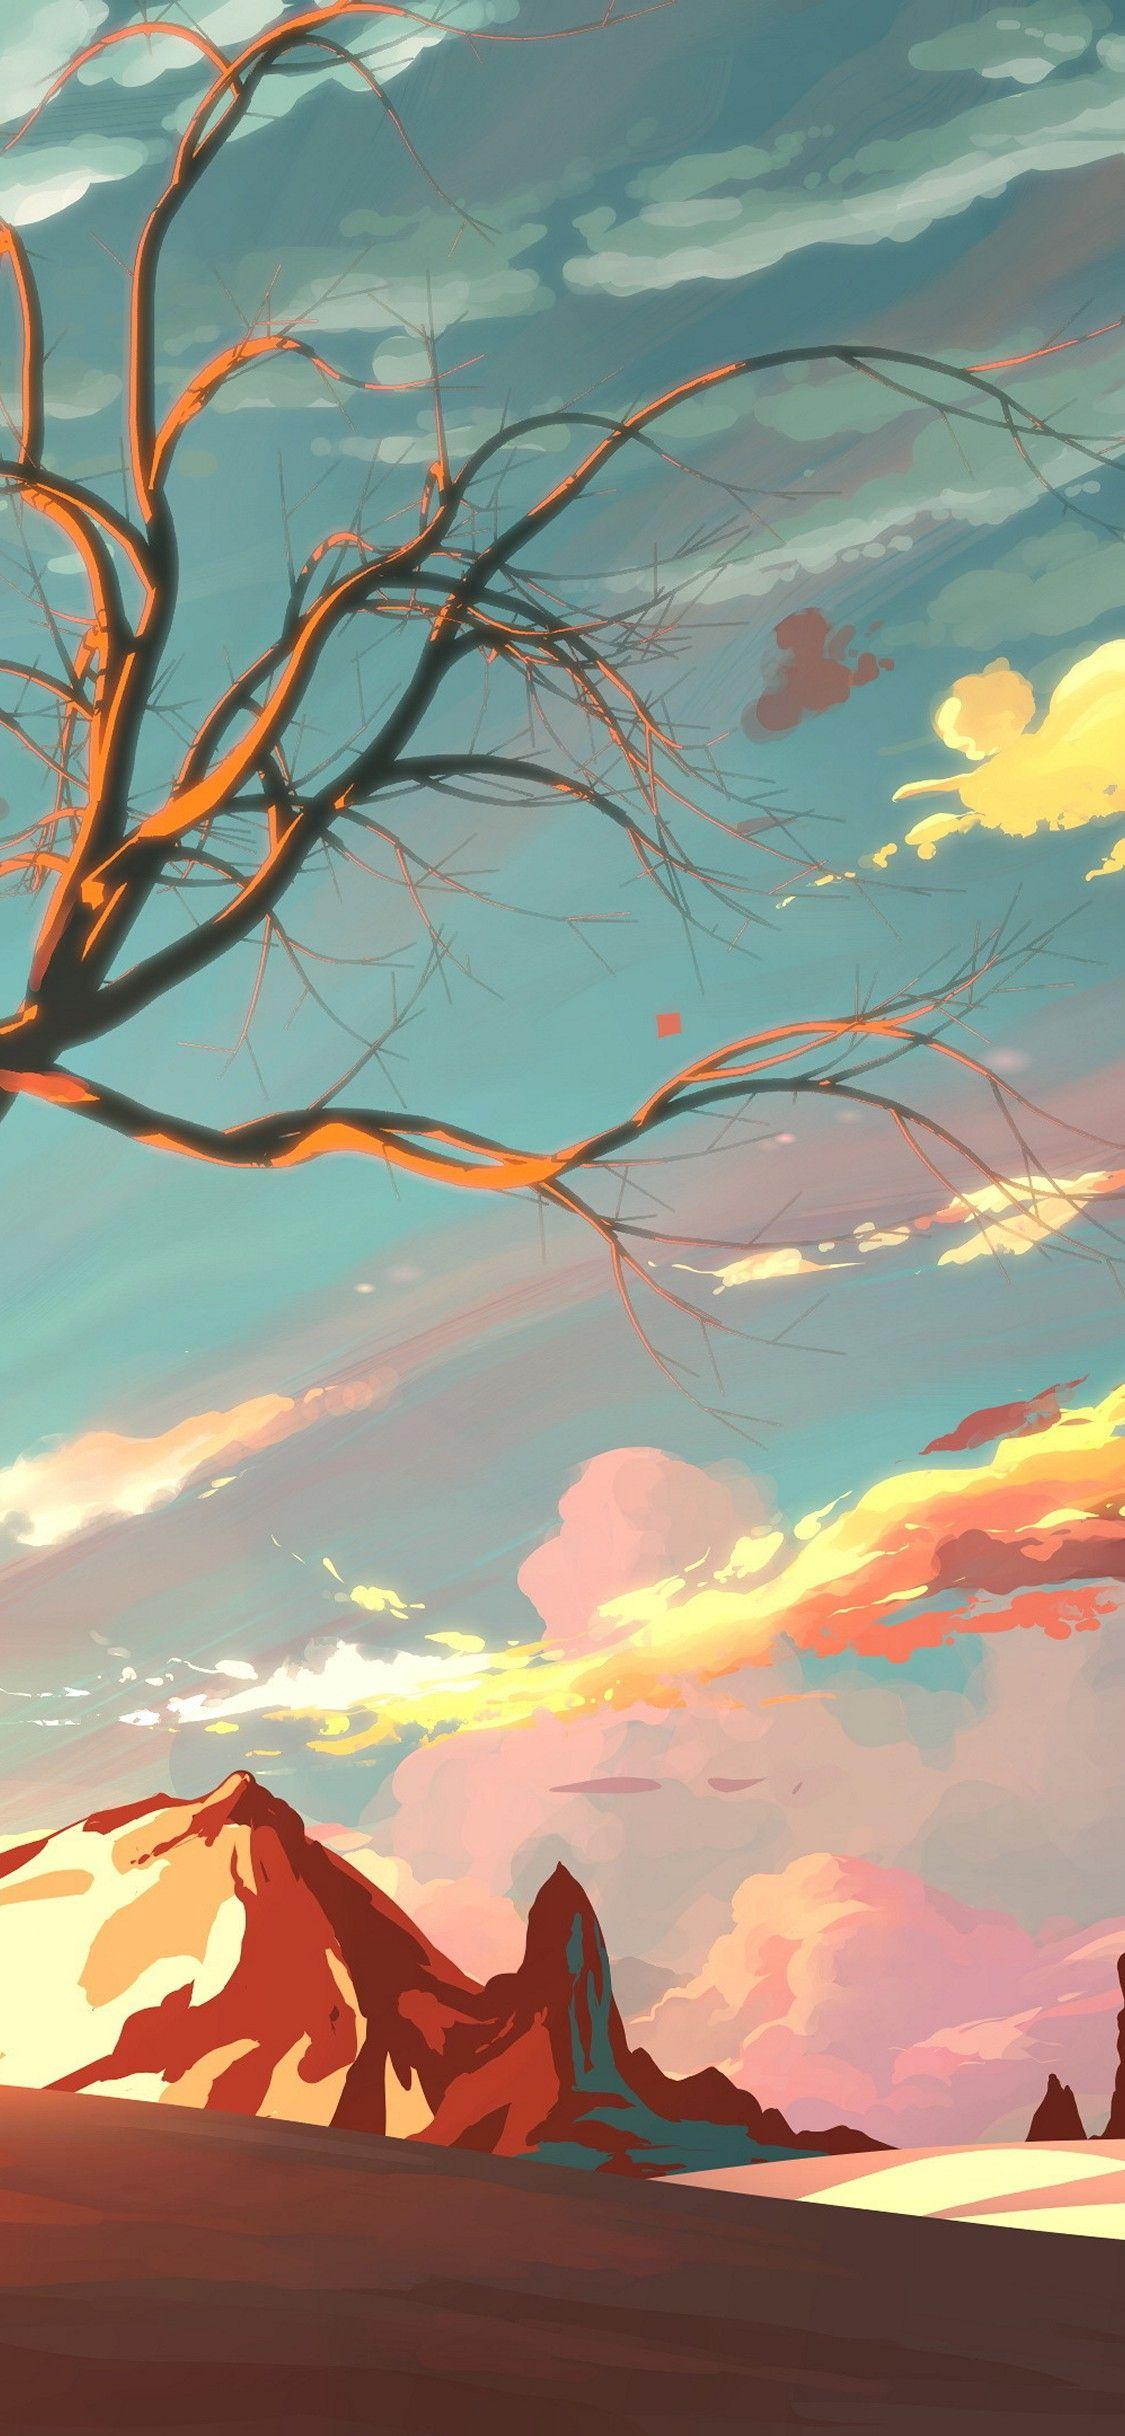 Warm Art Vibes Landscape wallpaper, Iphone wallpaper